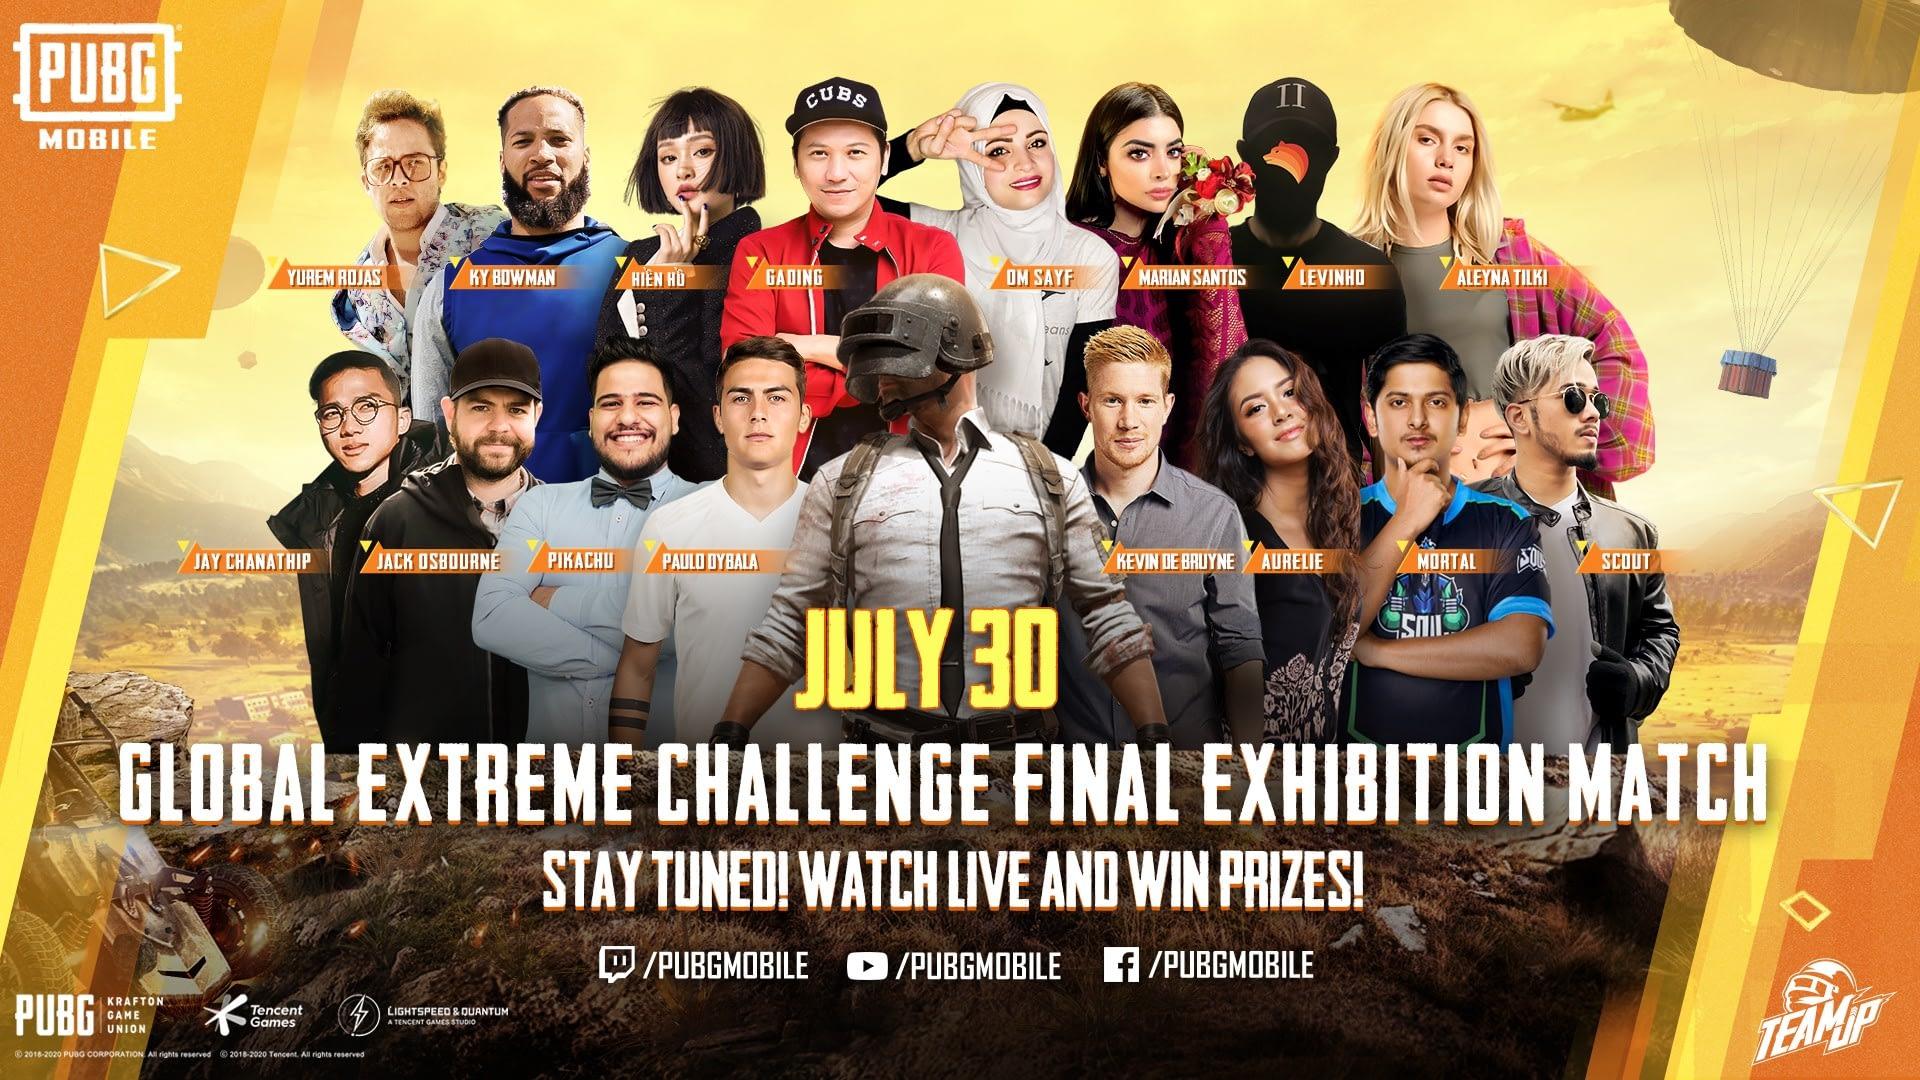 PUBG Mobile Global Extreme Challenge